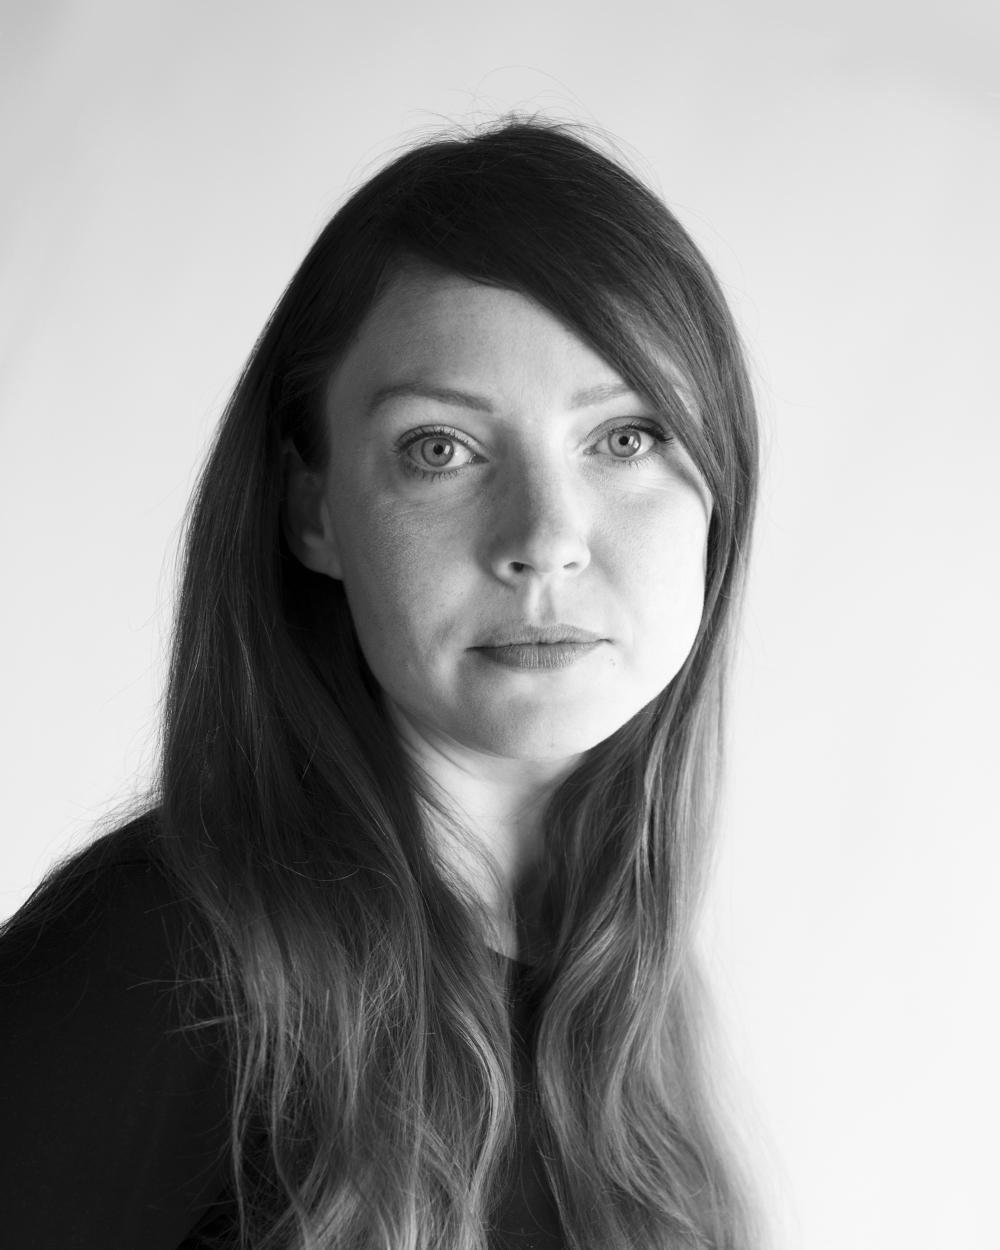 Sigrun Lydsdottir   Lens-based artist